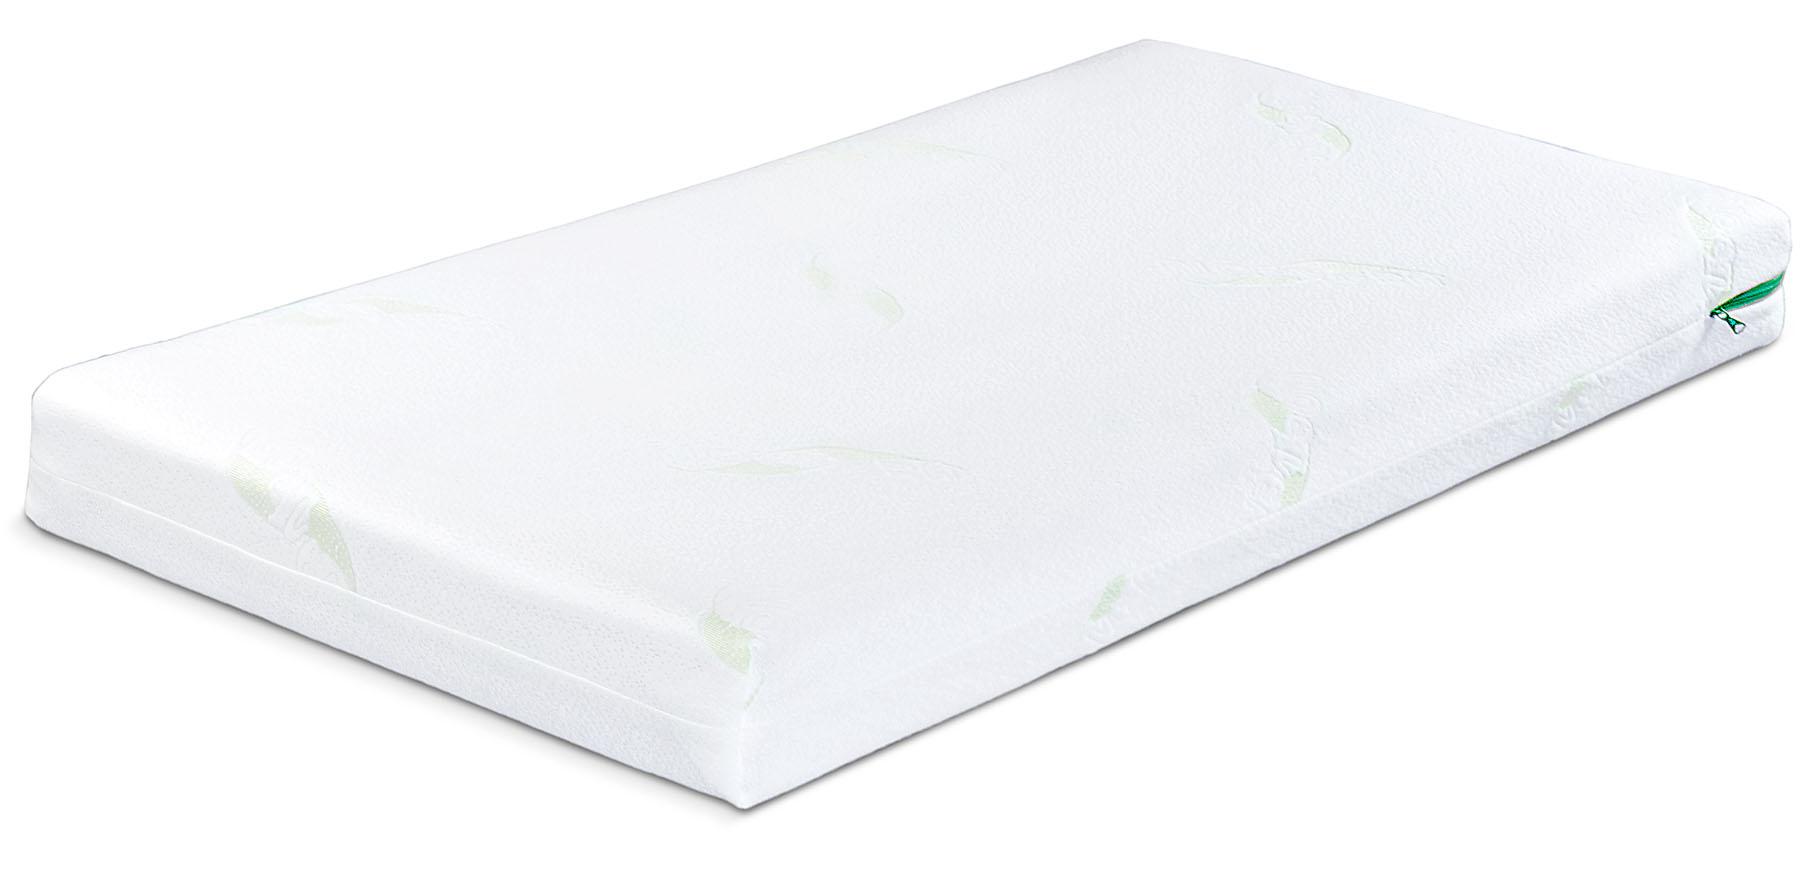 ALOE VERA 140 x 70 Latex-Foam-Coconut Mattress (Copy)